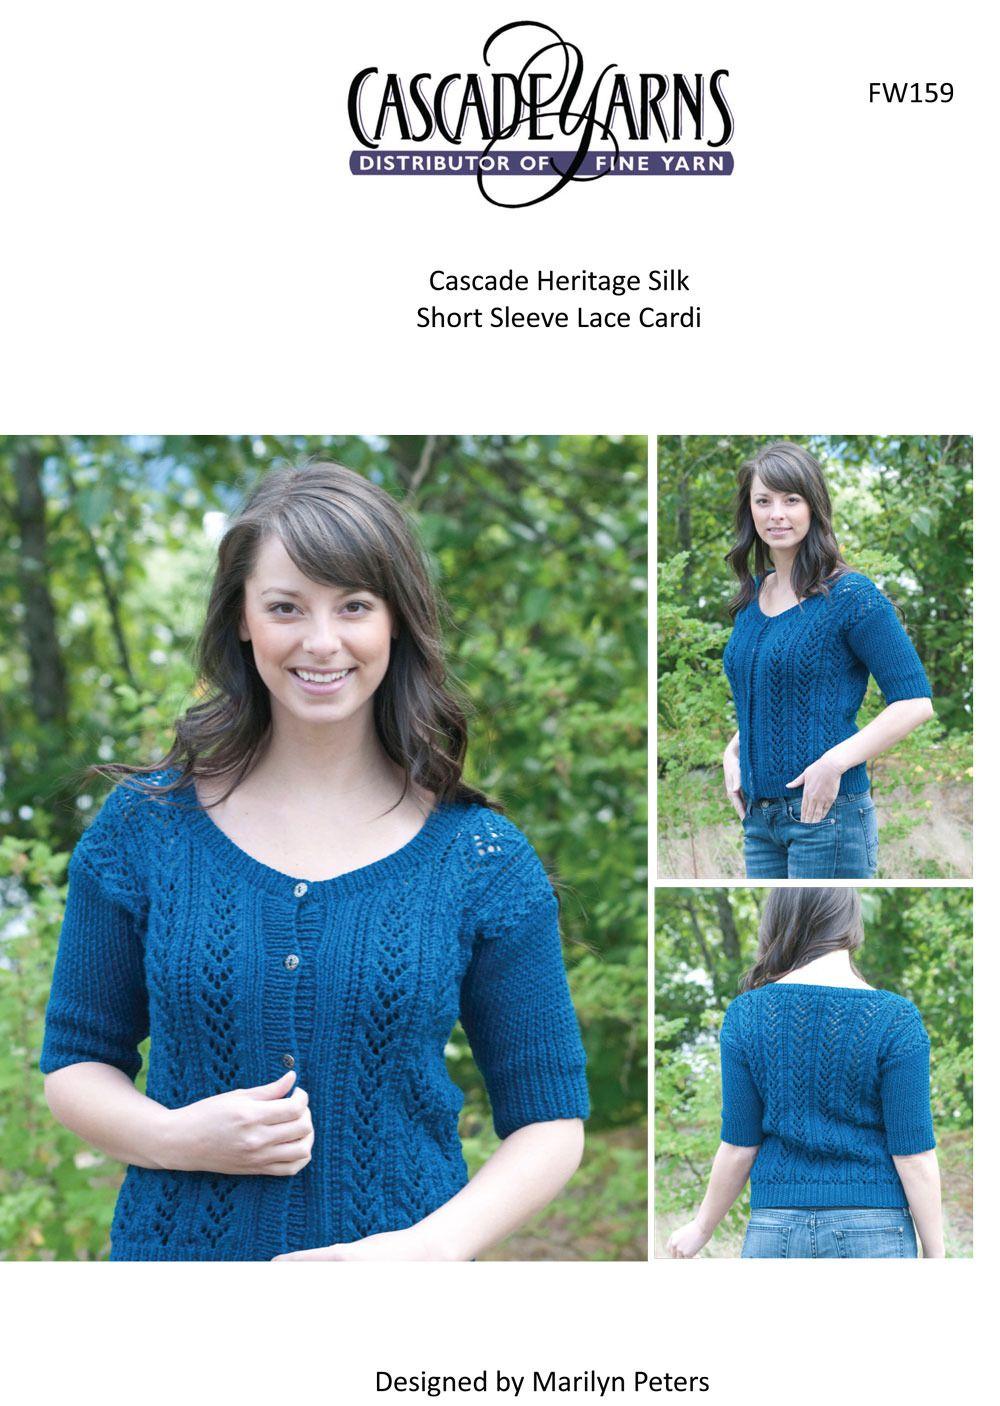 Sleeved lace cardi in cascade heritage silk short fw159 sleeved lace cardi in cascade heritage silk short fw159 knitting patterns loveknitting bankloansurffo Gallery